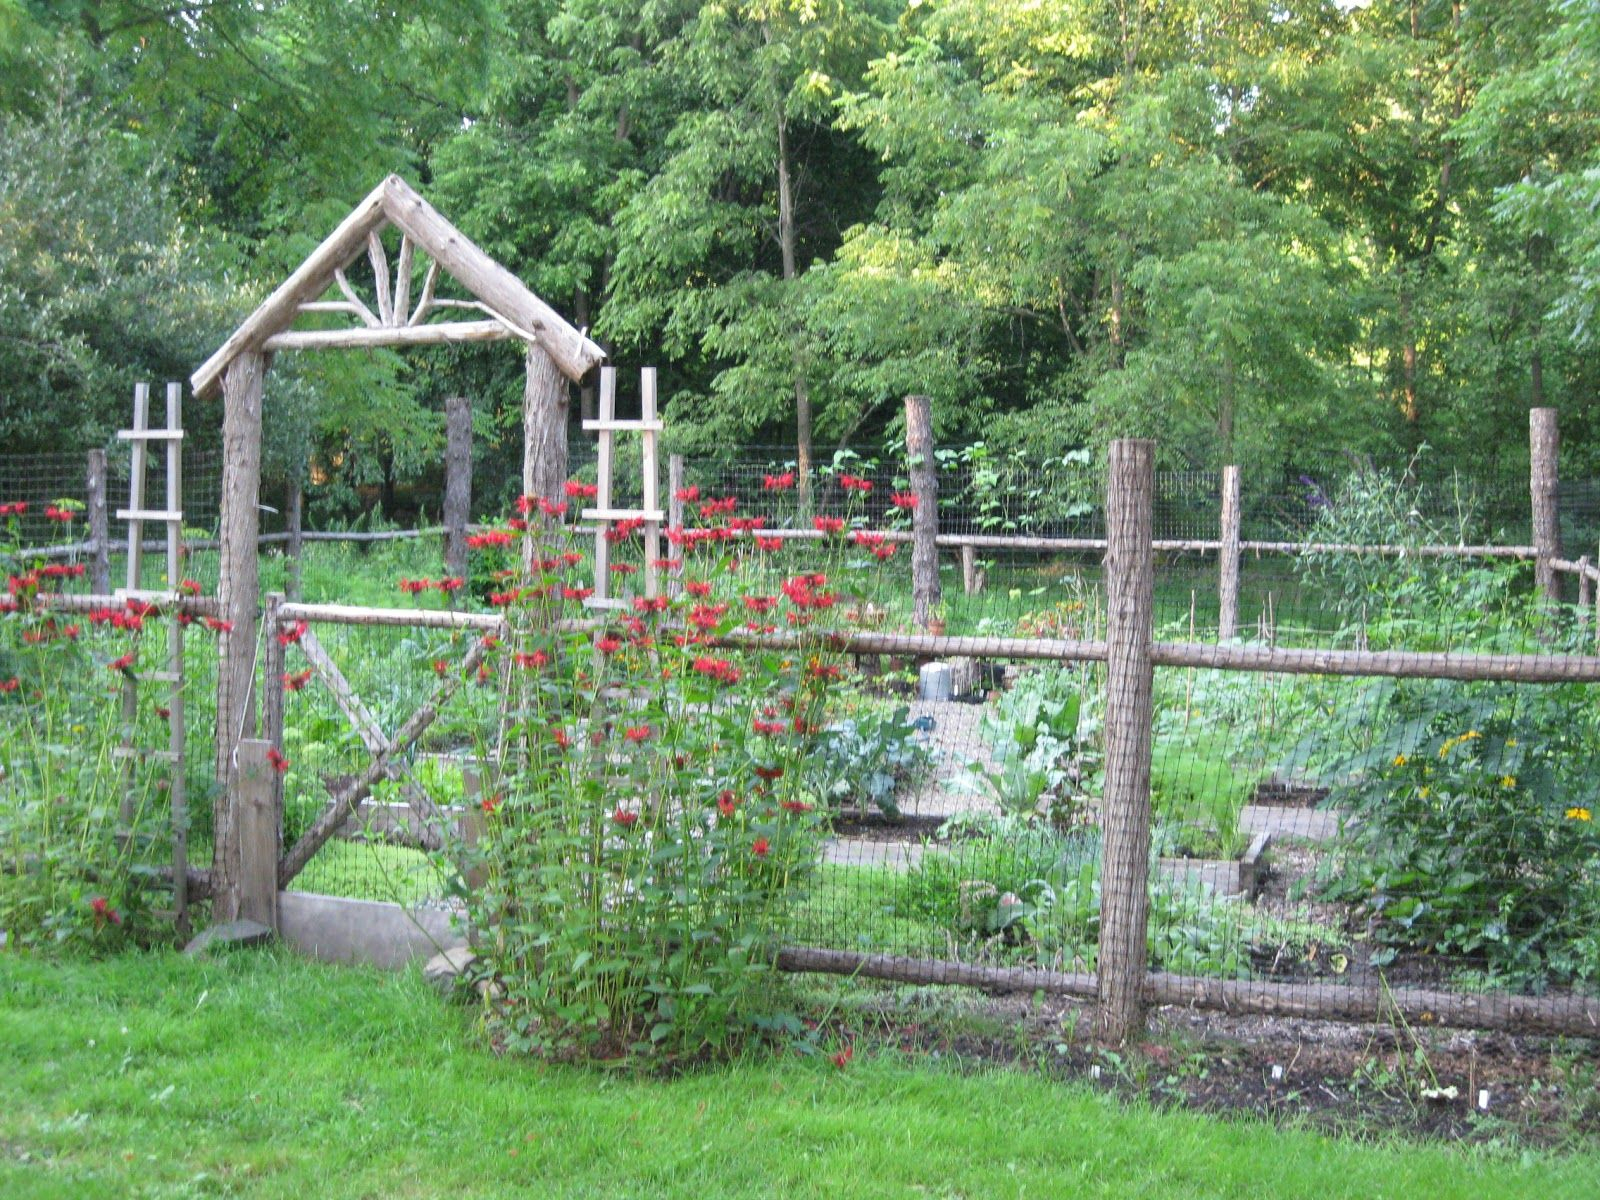 Clôture Potager | Design De Jardin Potager, Design Jardin ... dedans Petite Barriere Jardin